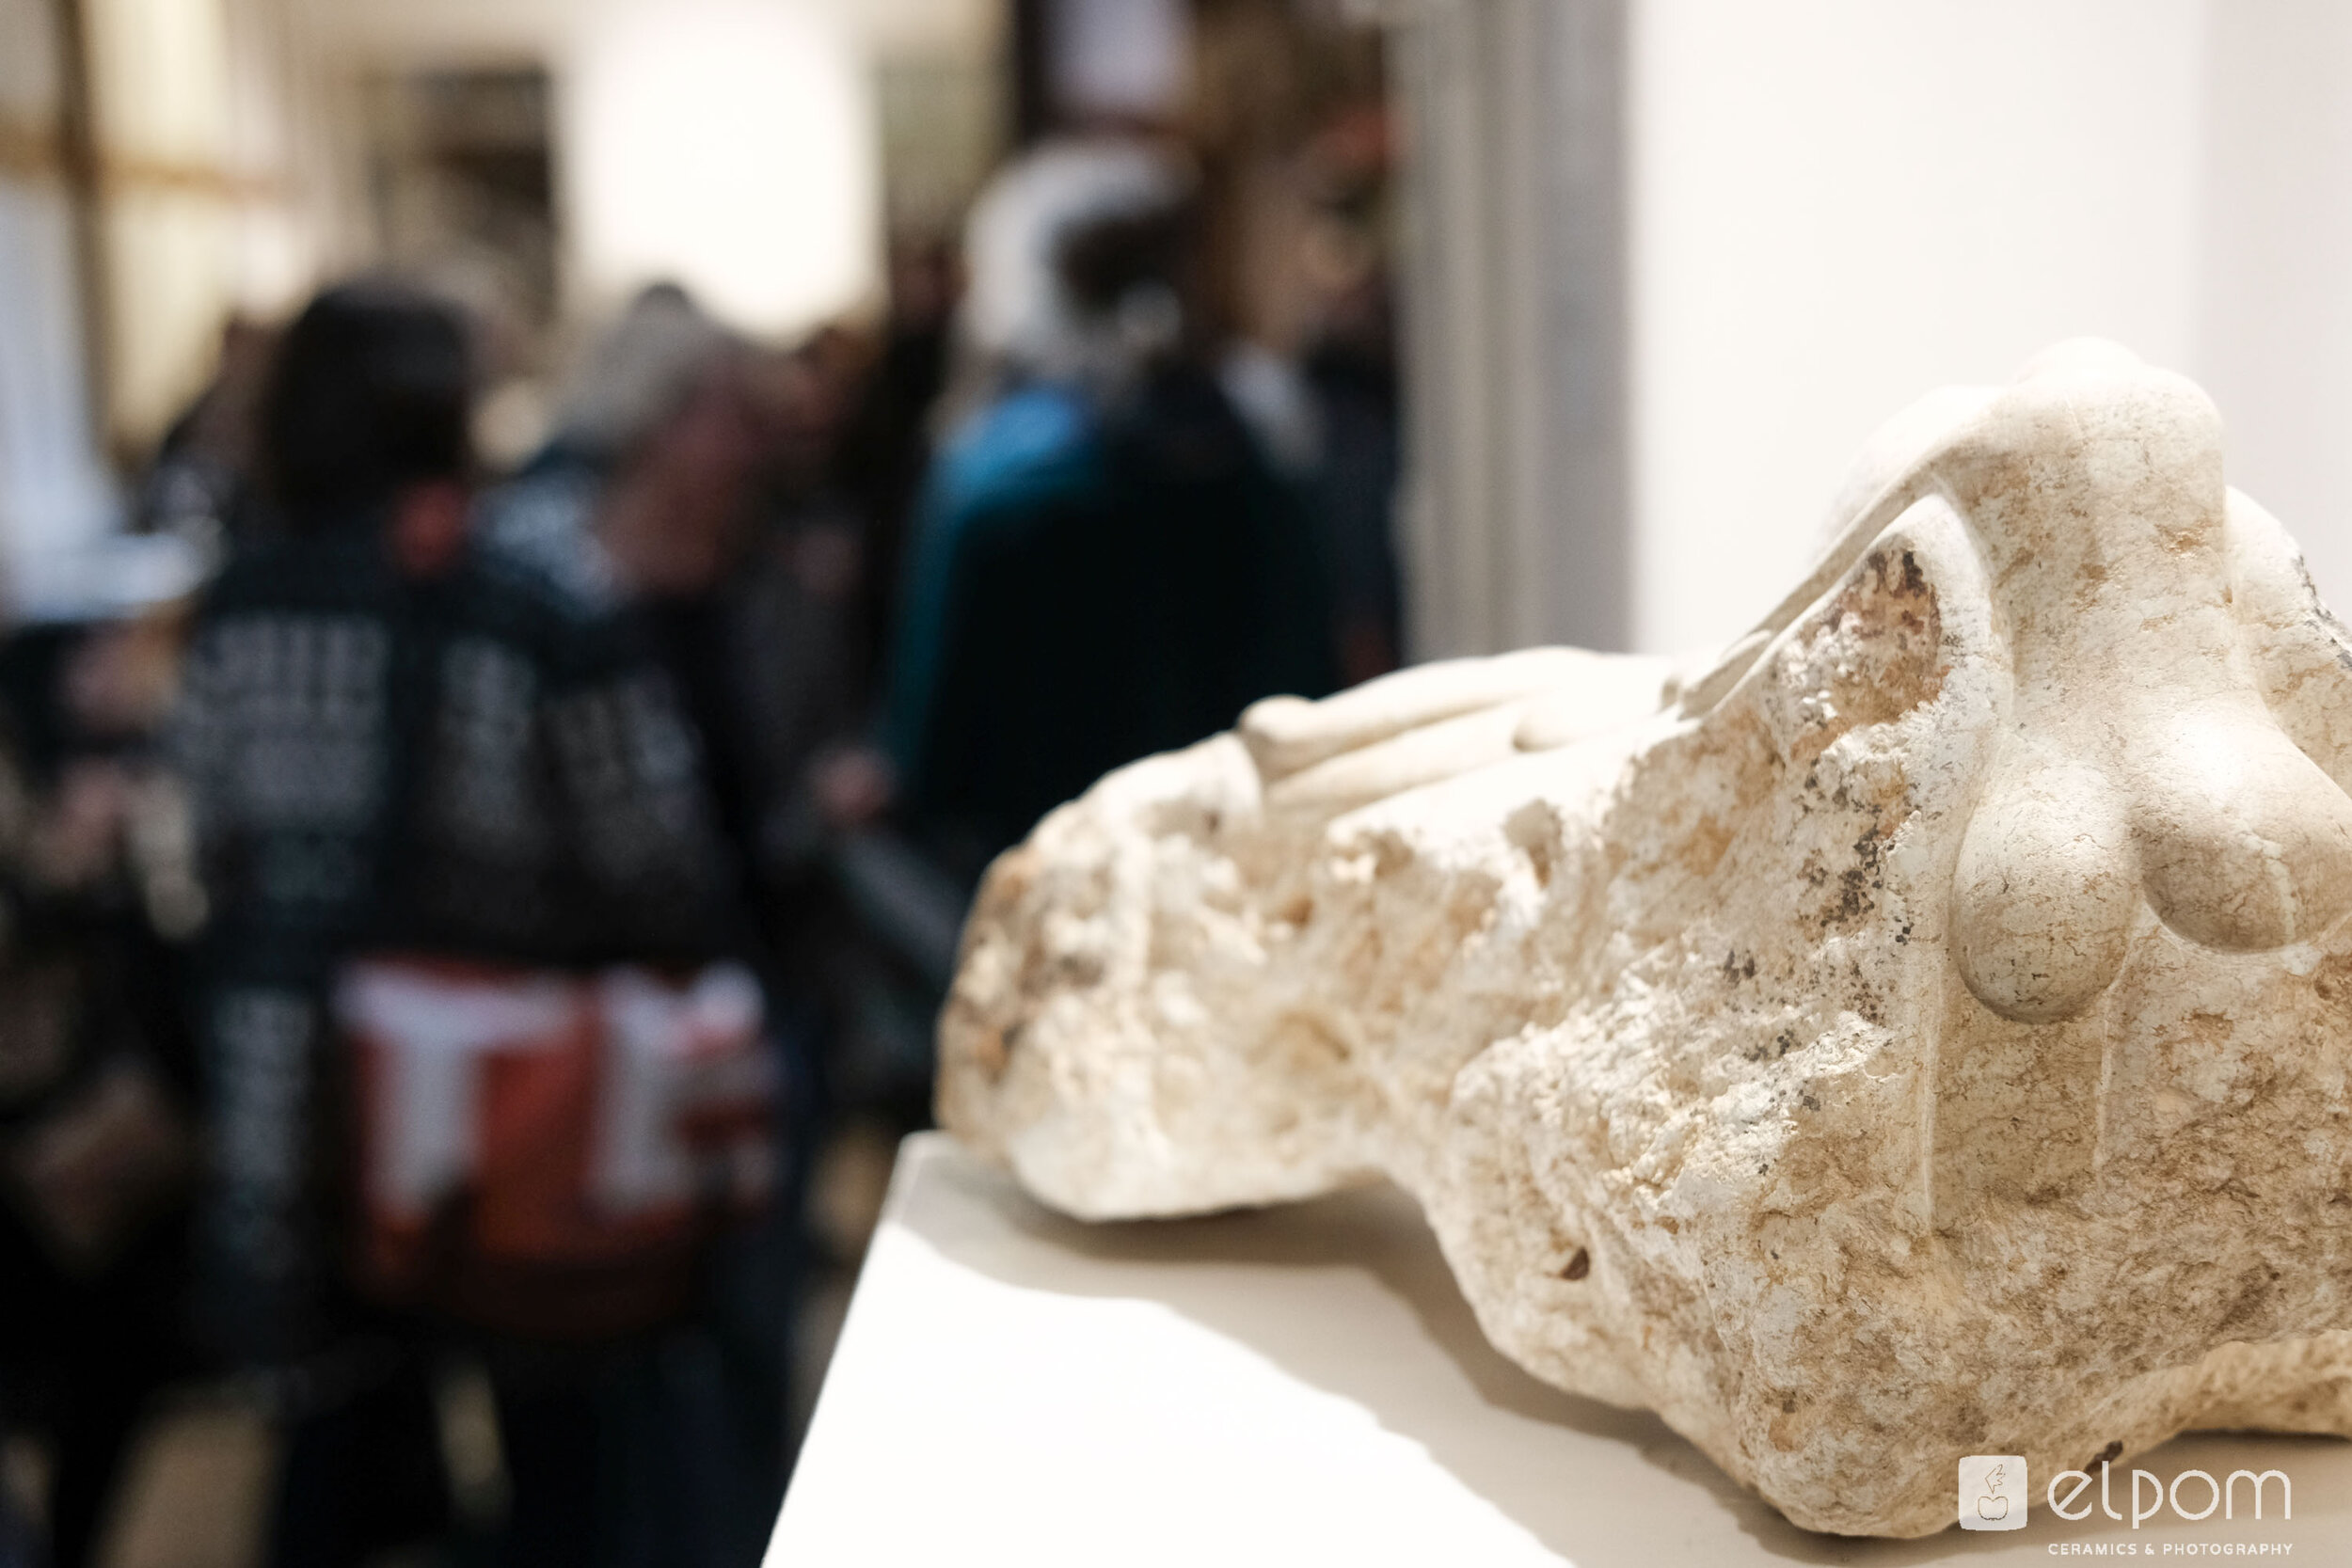 Vernissage: Neun 2018  Skulptur von Claudia Stickel